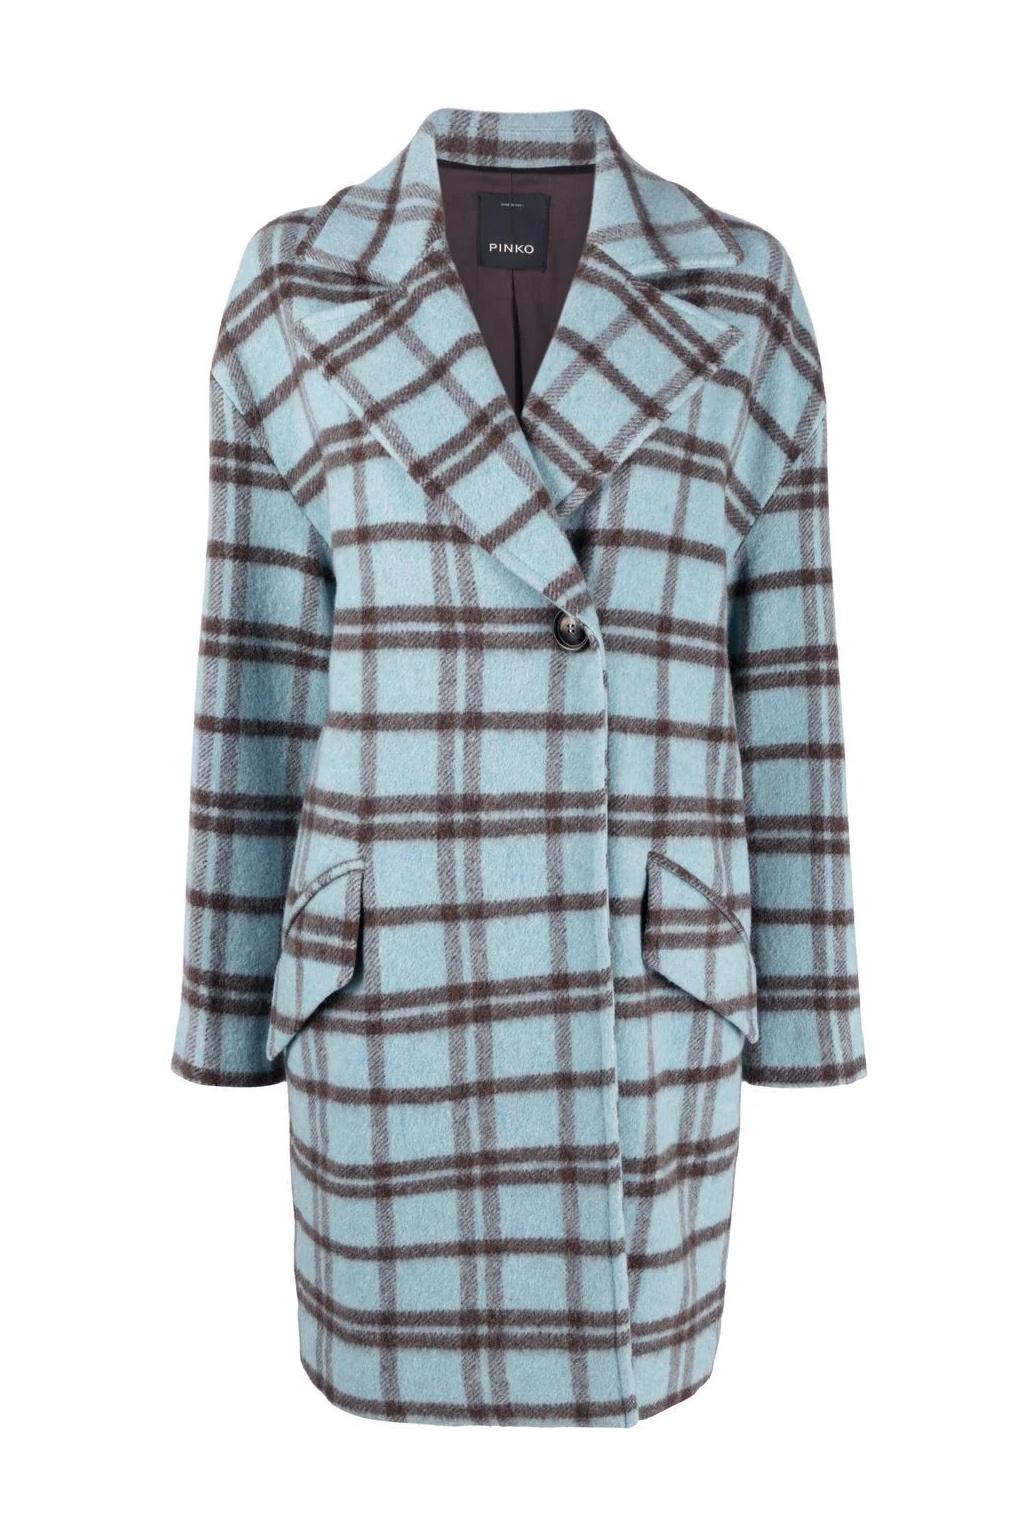 Dámský kabát Pinko Acarigua 2 modrý